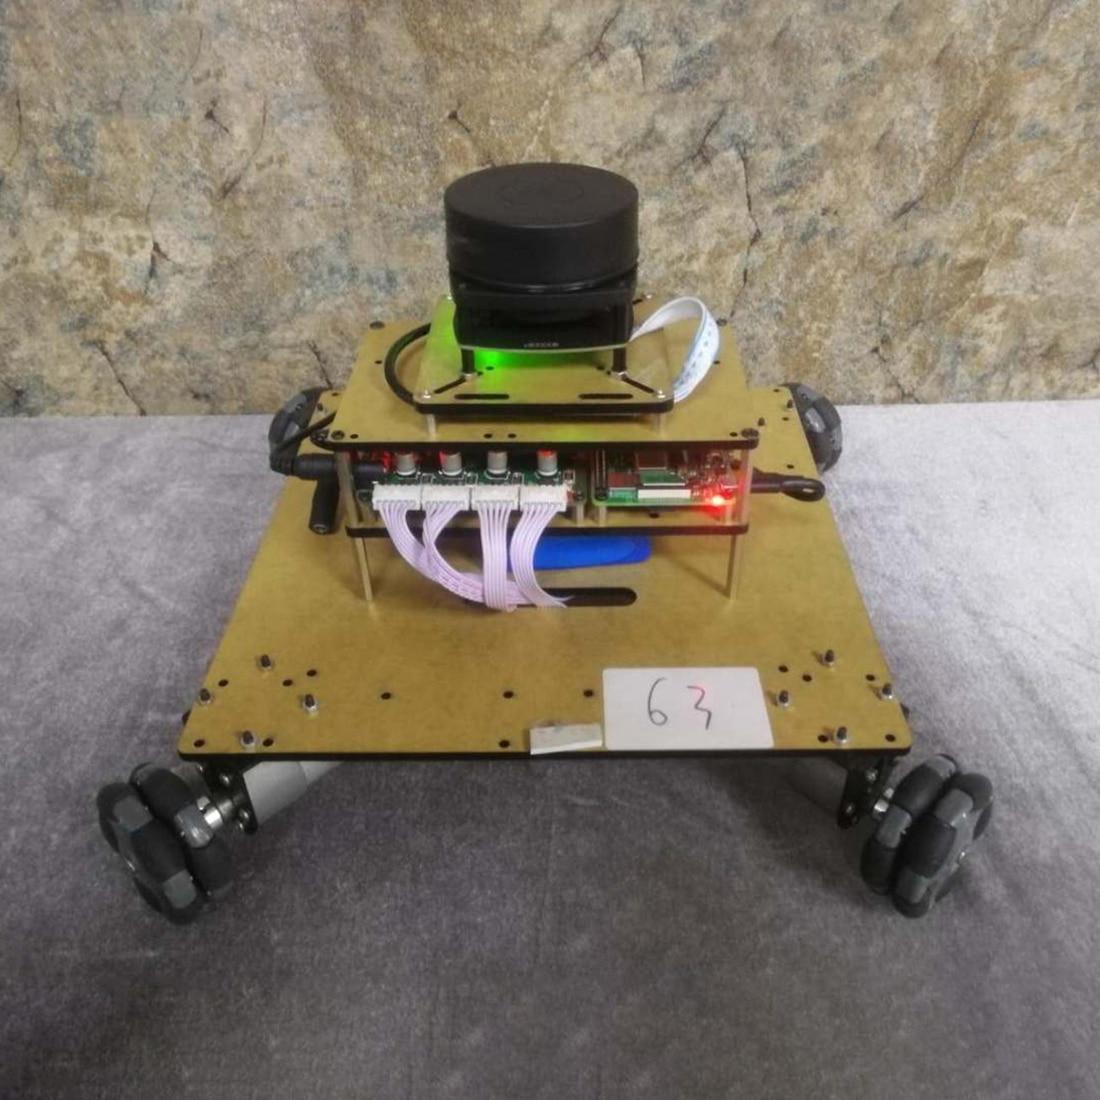 Robot Operating System Ailibot Omnidirectional Robot Car Kit Programmable Toys Set Kids Adults Christmas Gift - 03 / 04 Version